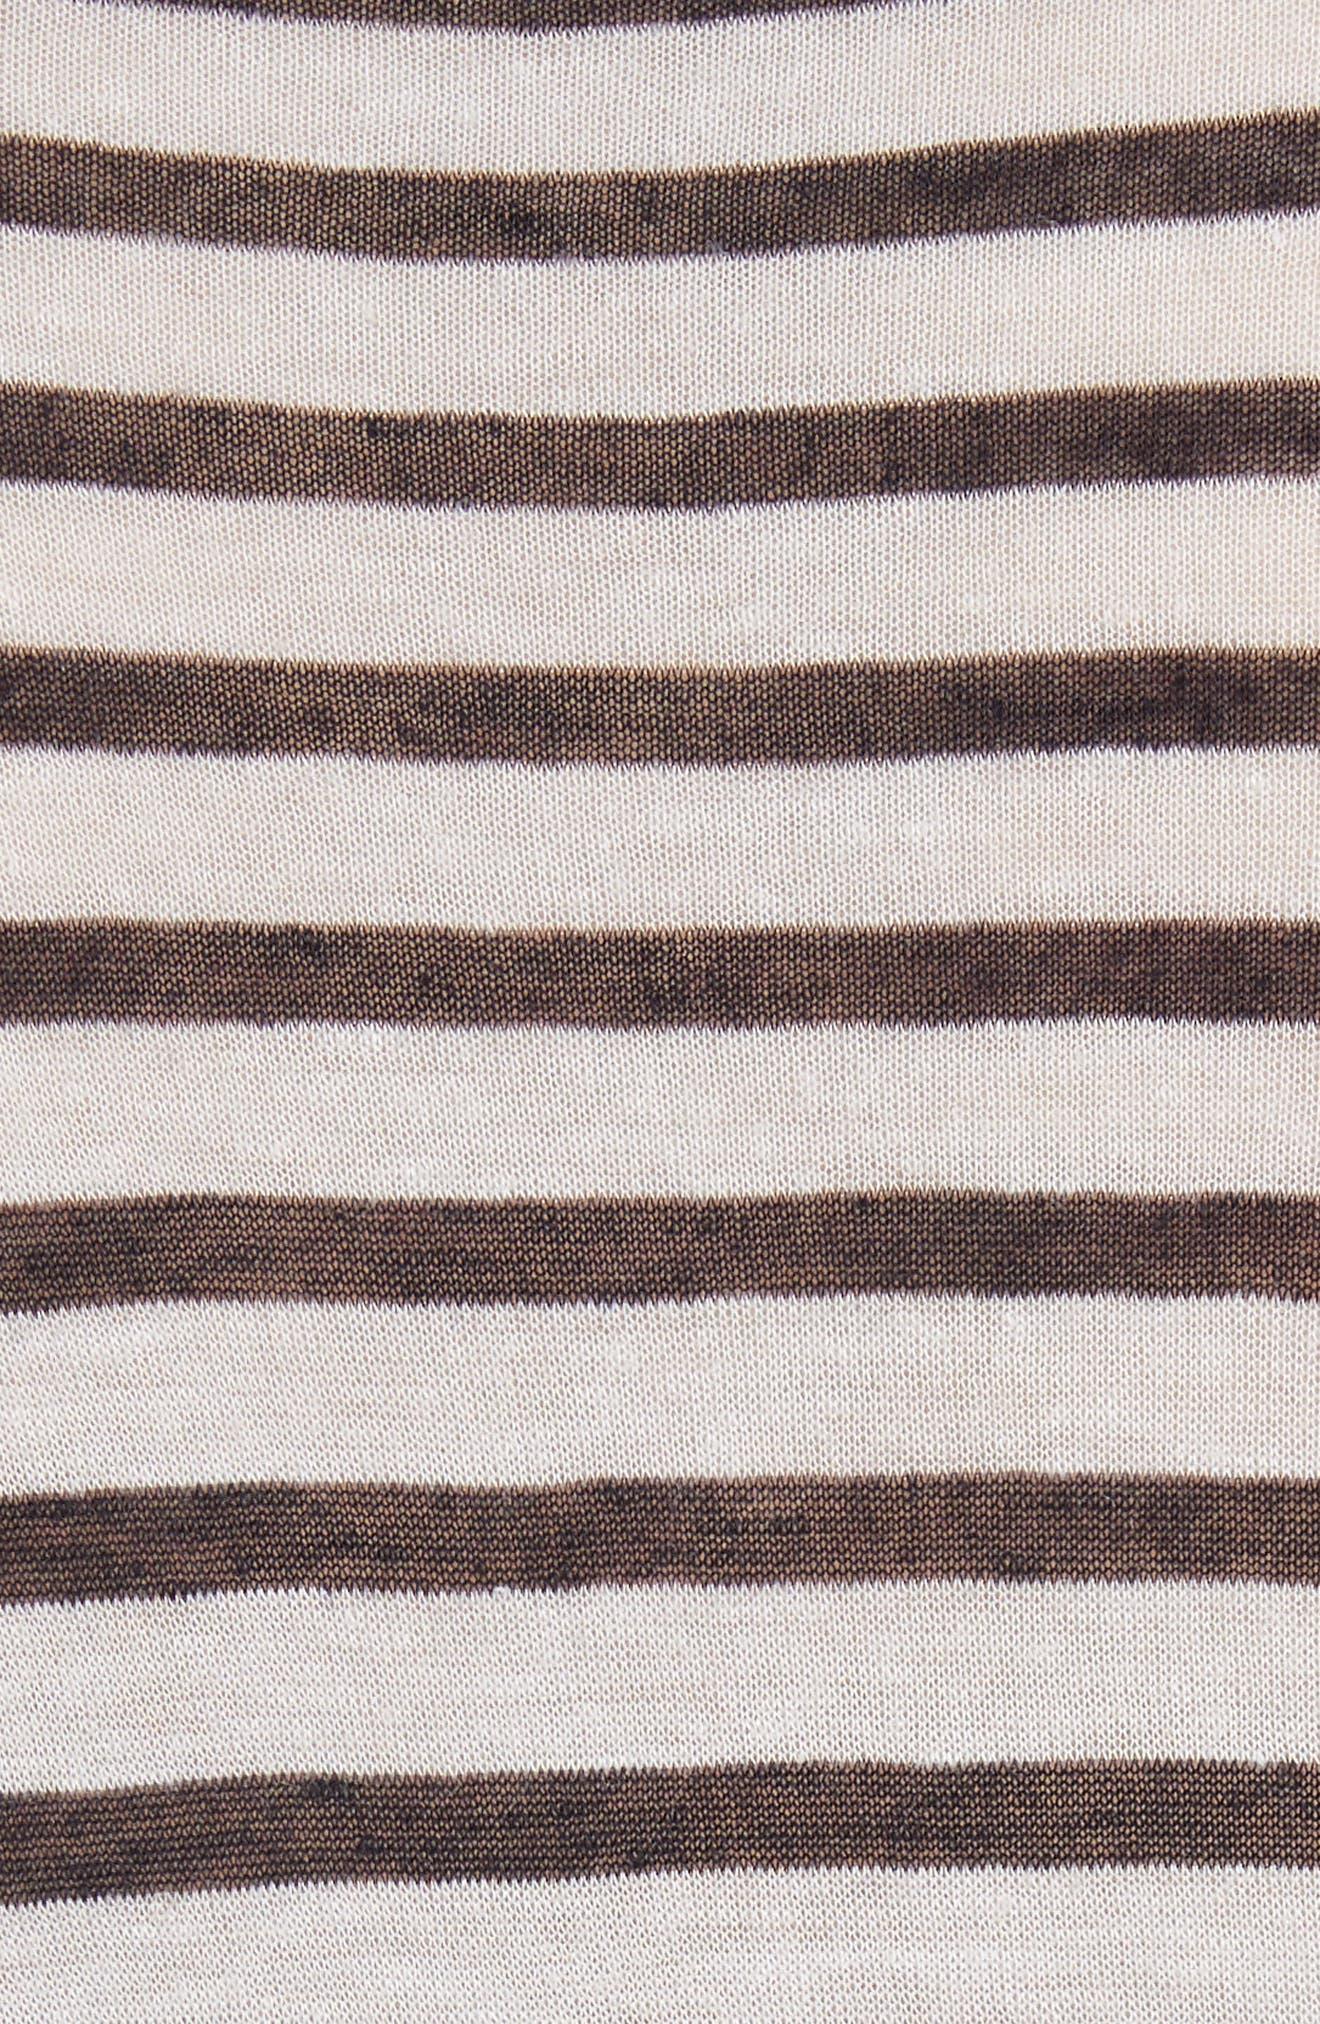 T by Alexander Wang Side Tie Stripe Slub Jersey Tee,                             Alternate thumbnail 5, color,                             419